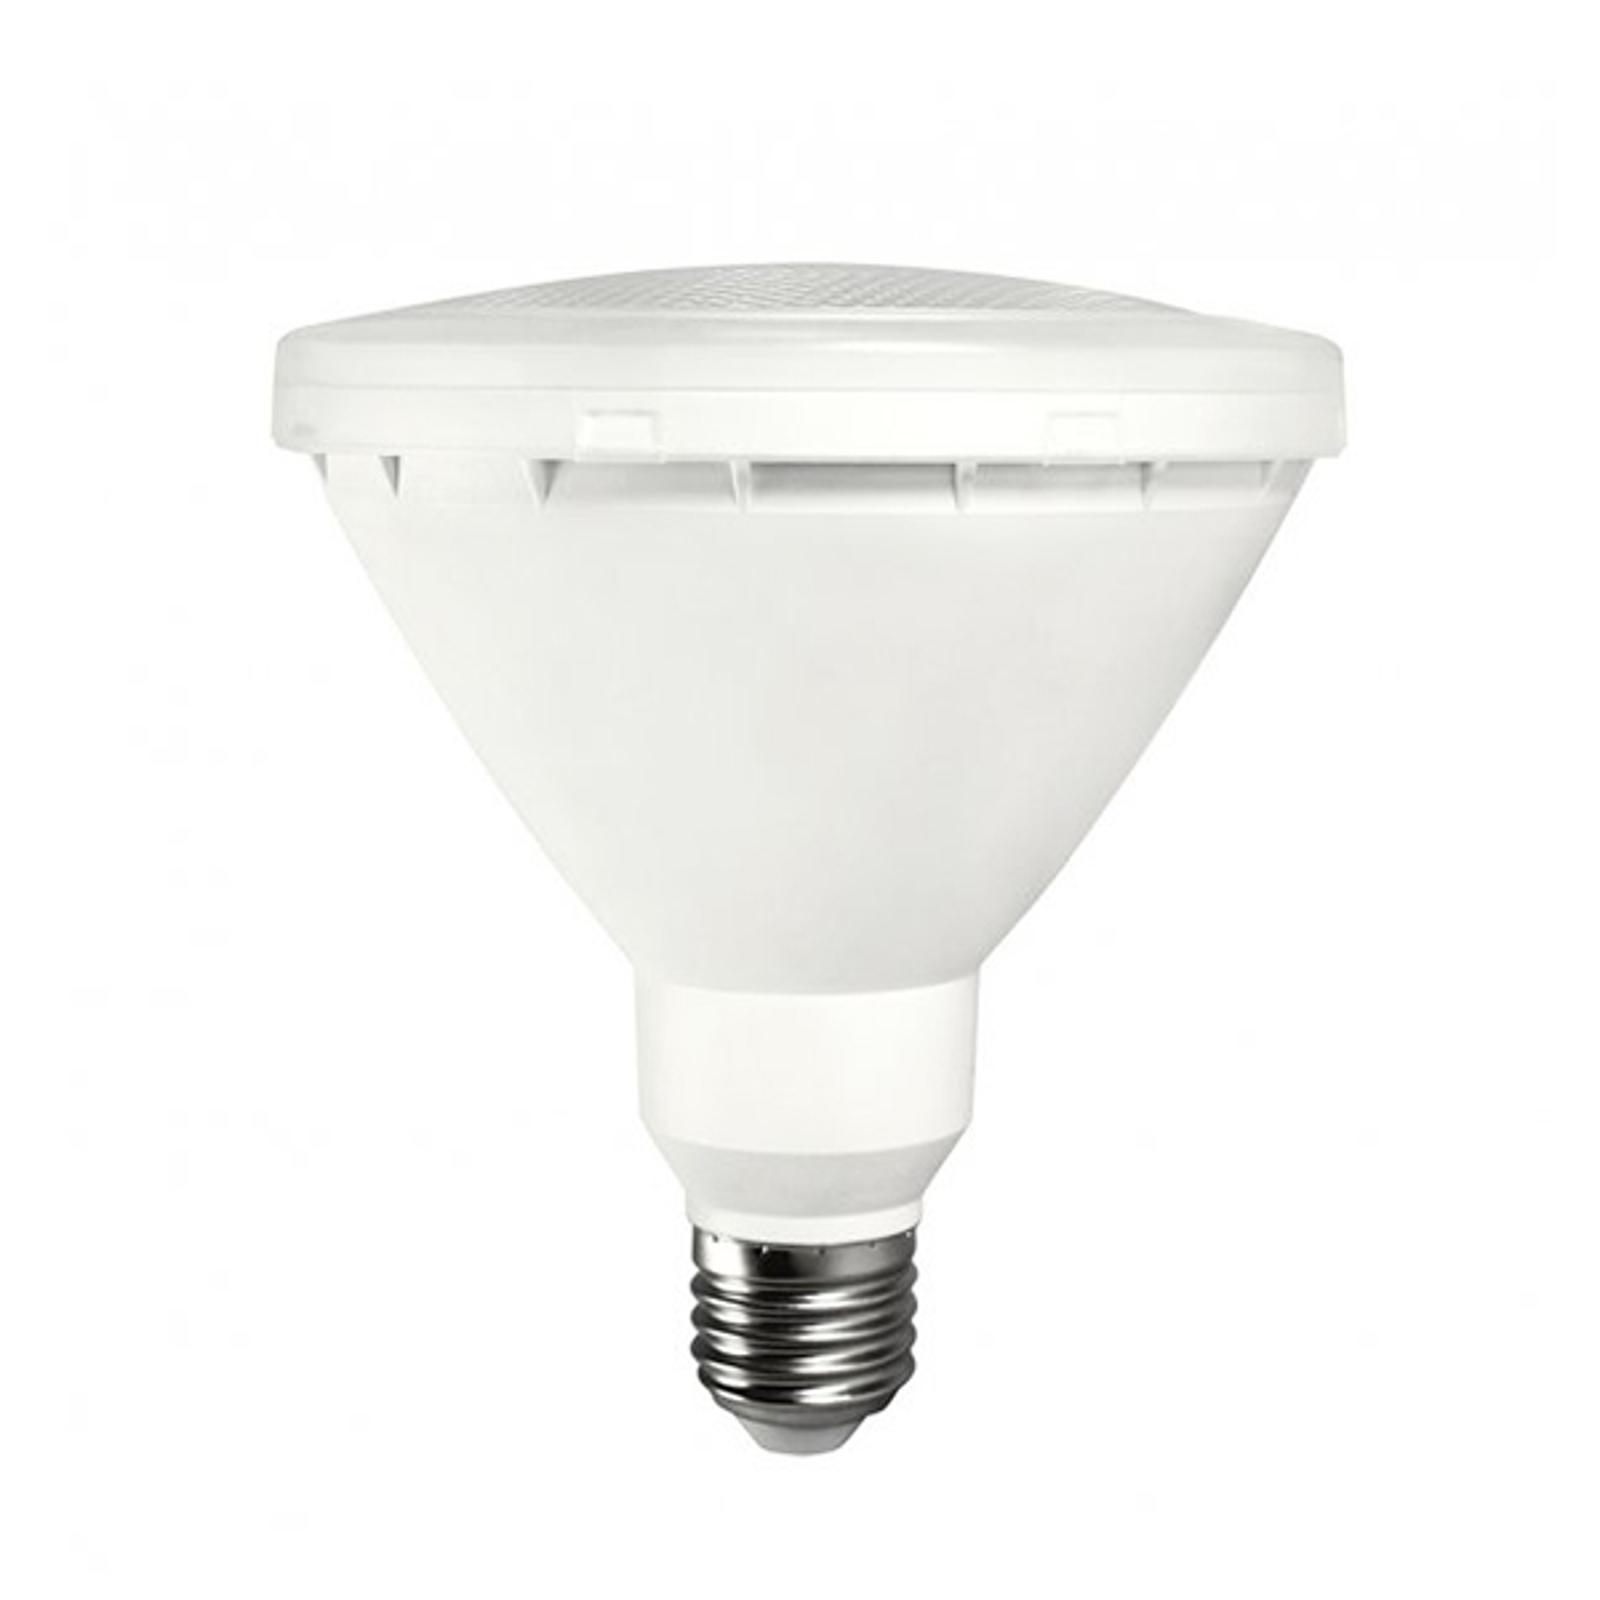 Faretto LED E27 15 W 827 RODER PAR38 tenuta stagna